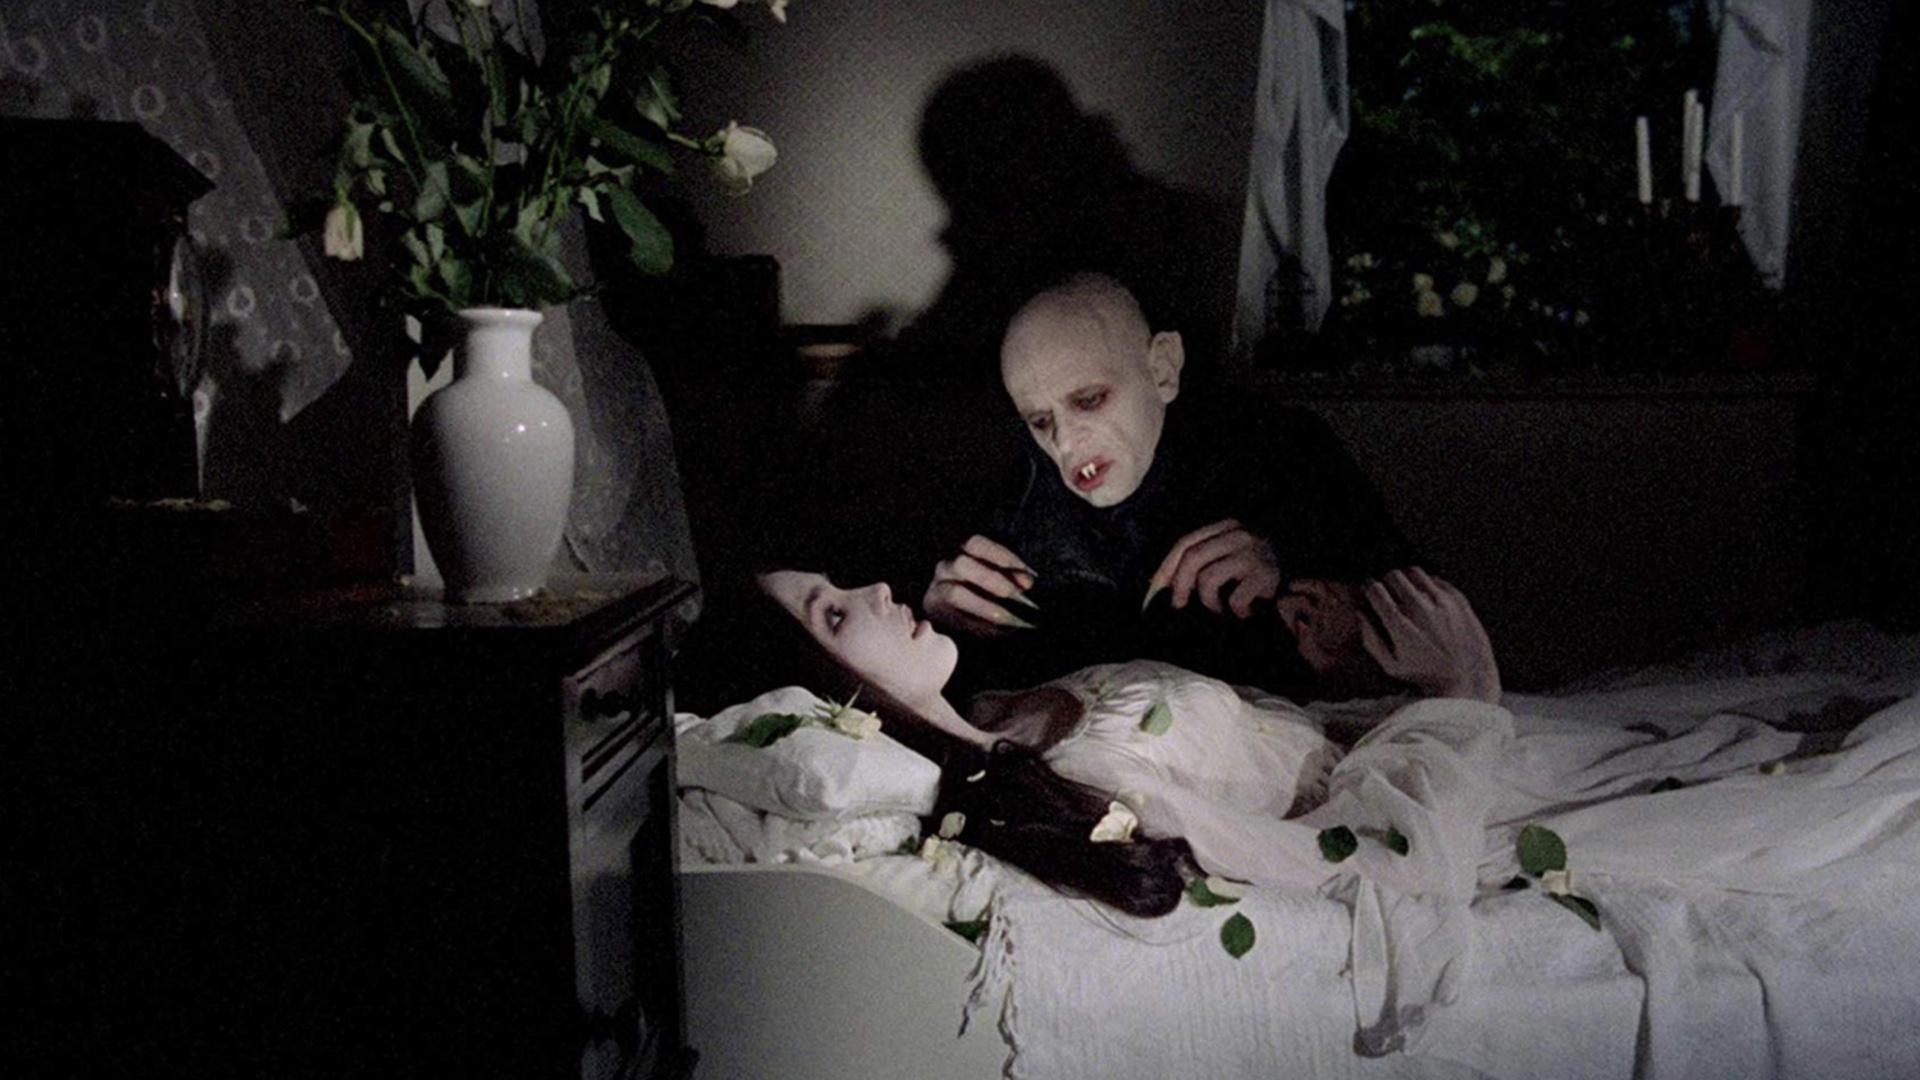 Nosferatu The Vampyre (1979) - Trailer